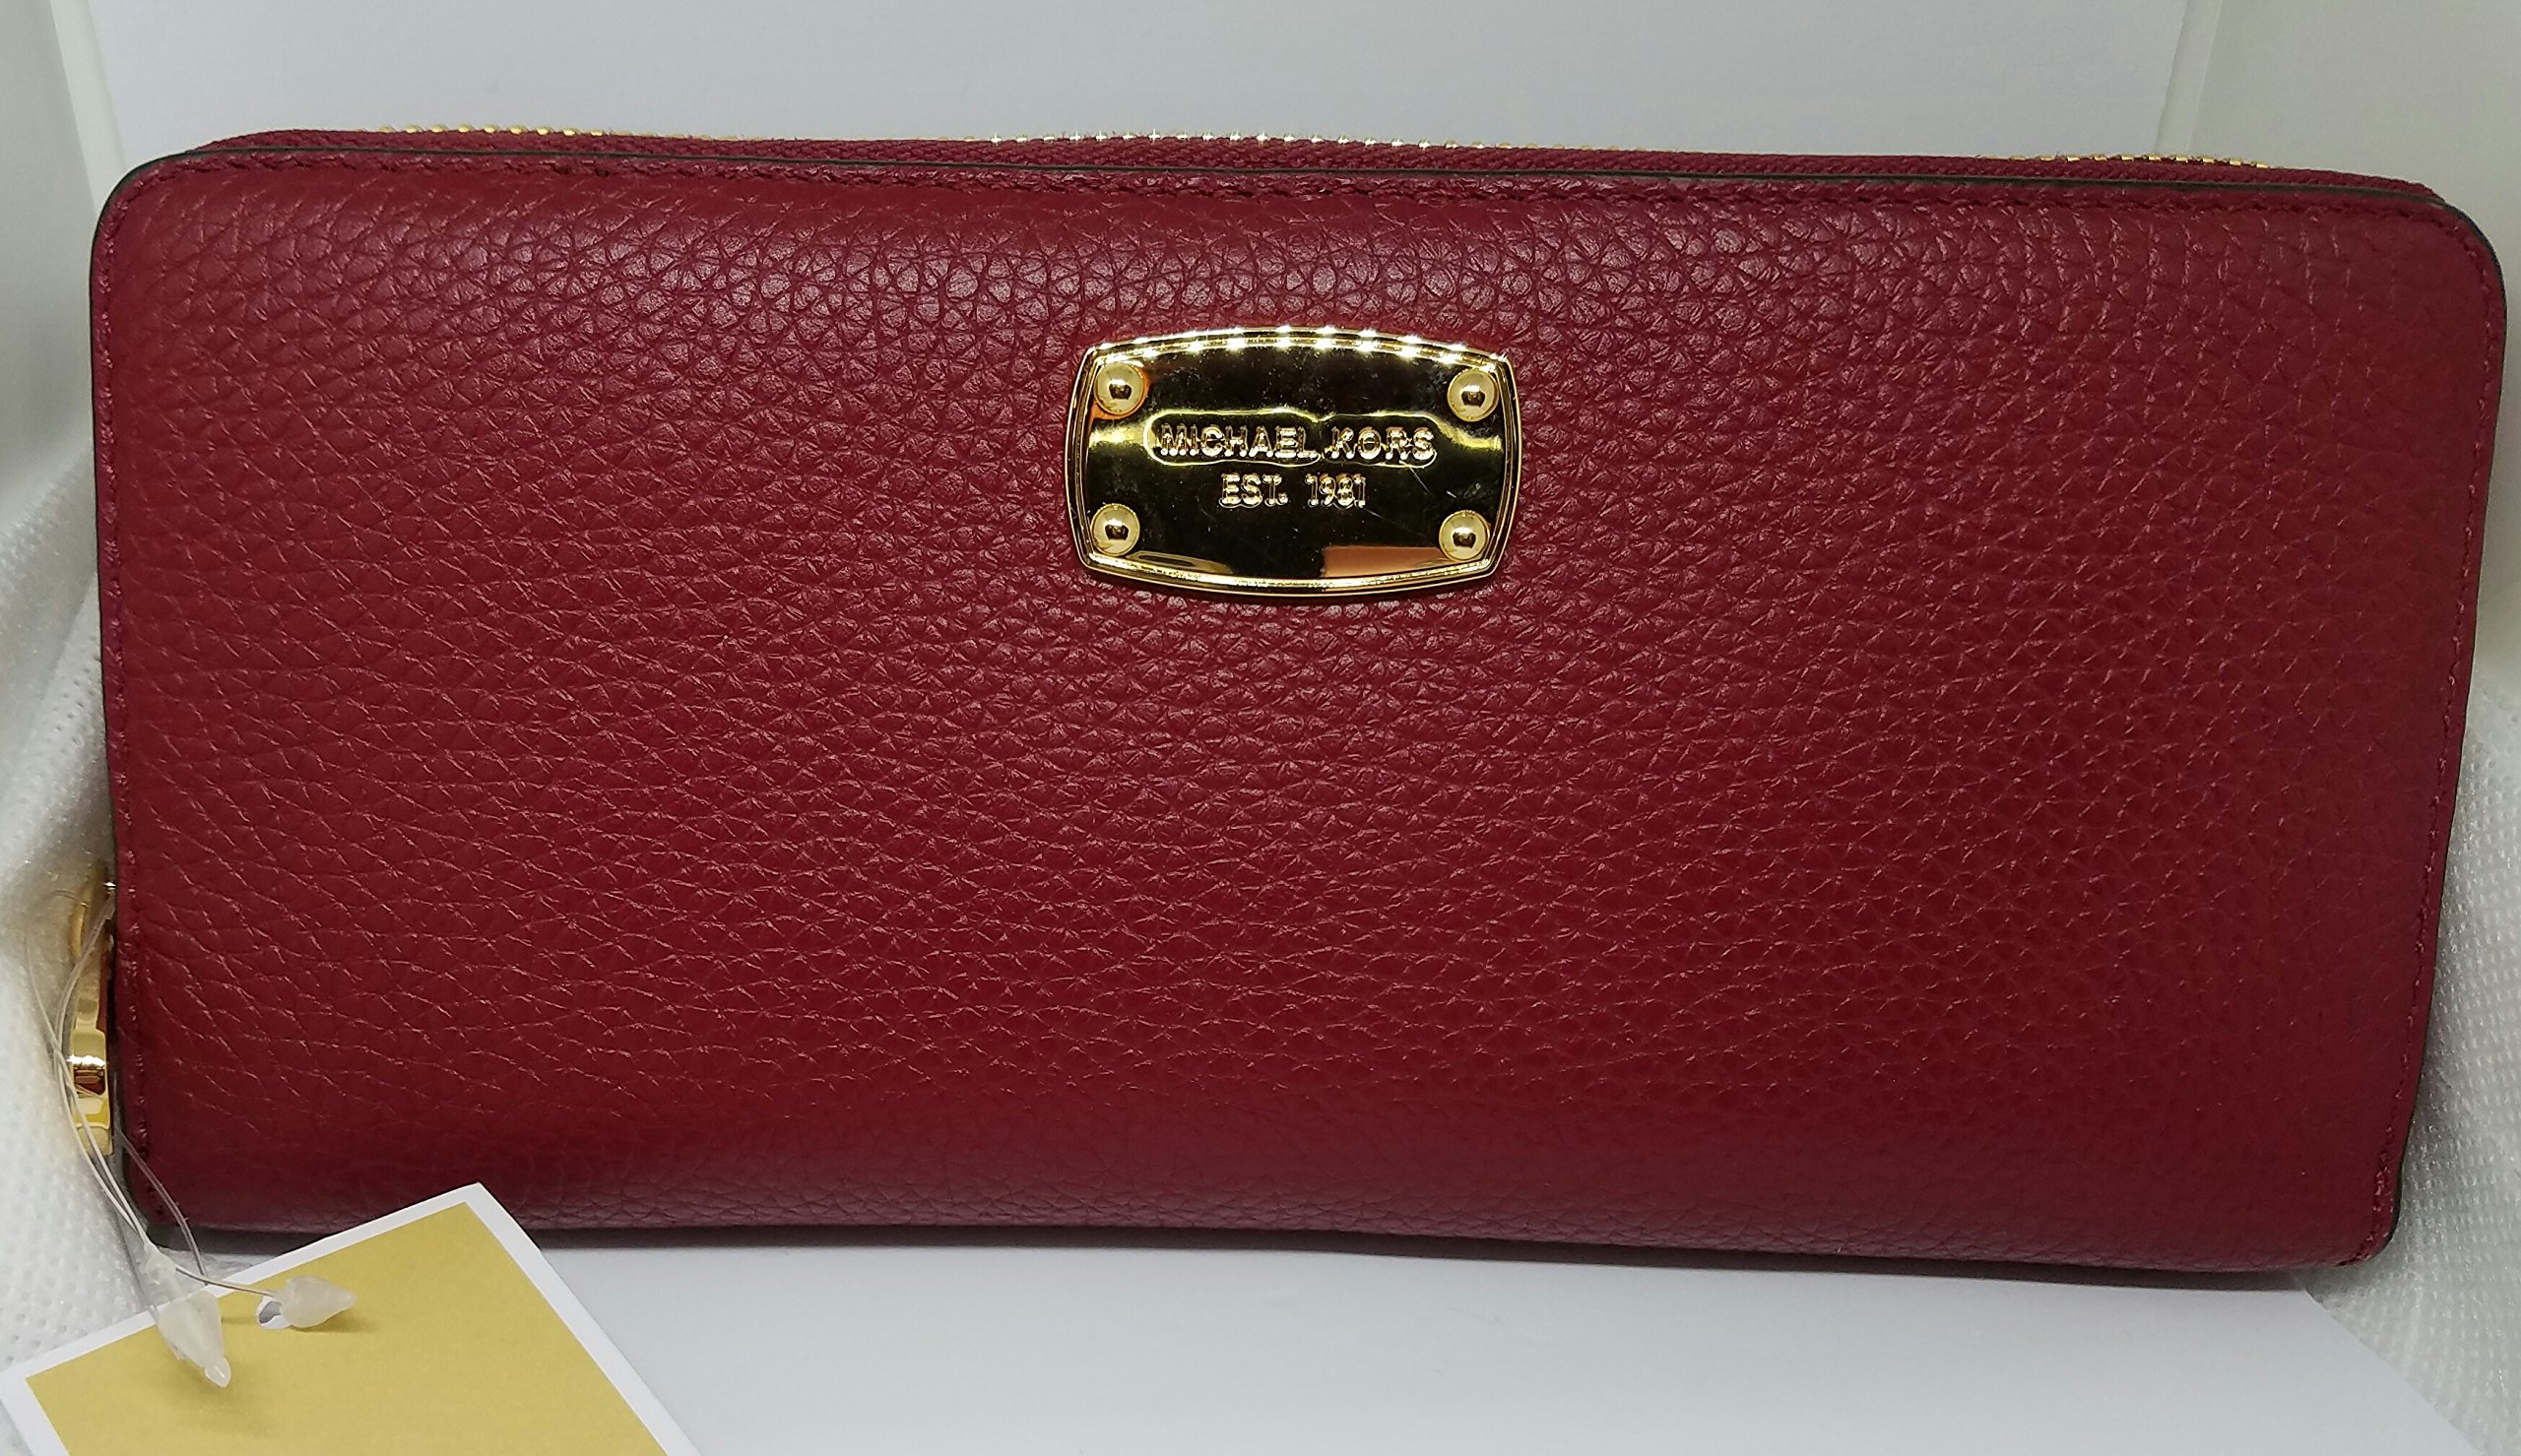 Michael Kors Jet Set Travel Zip Around Pebbled Leather Wallet, Cherry